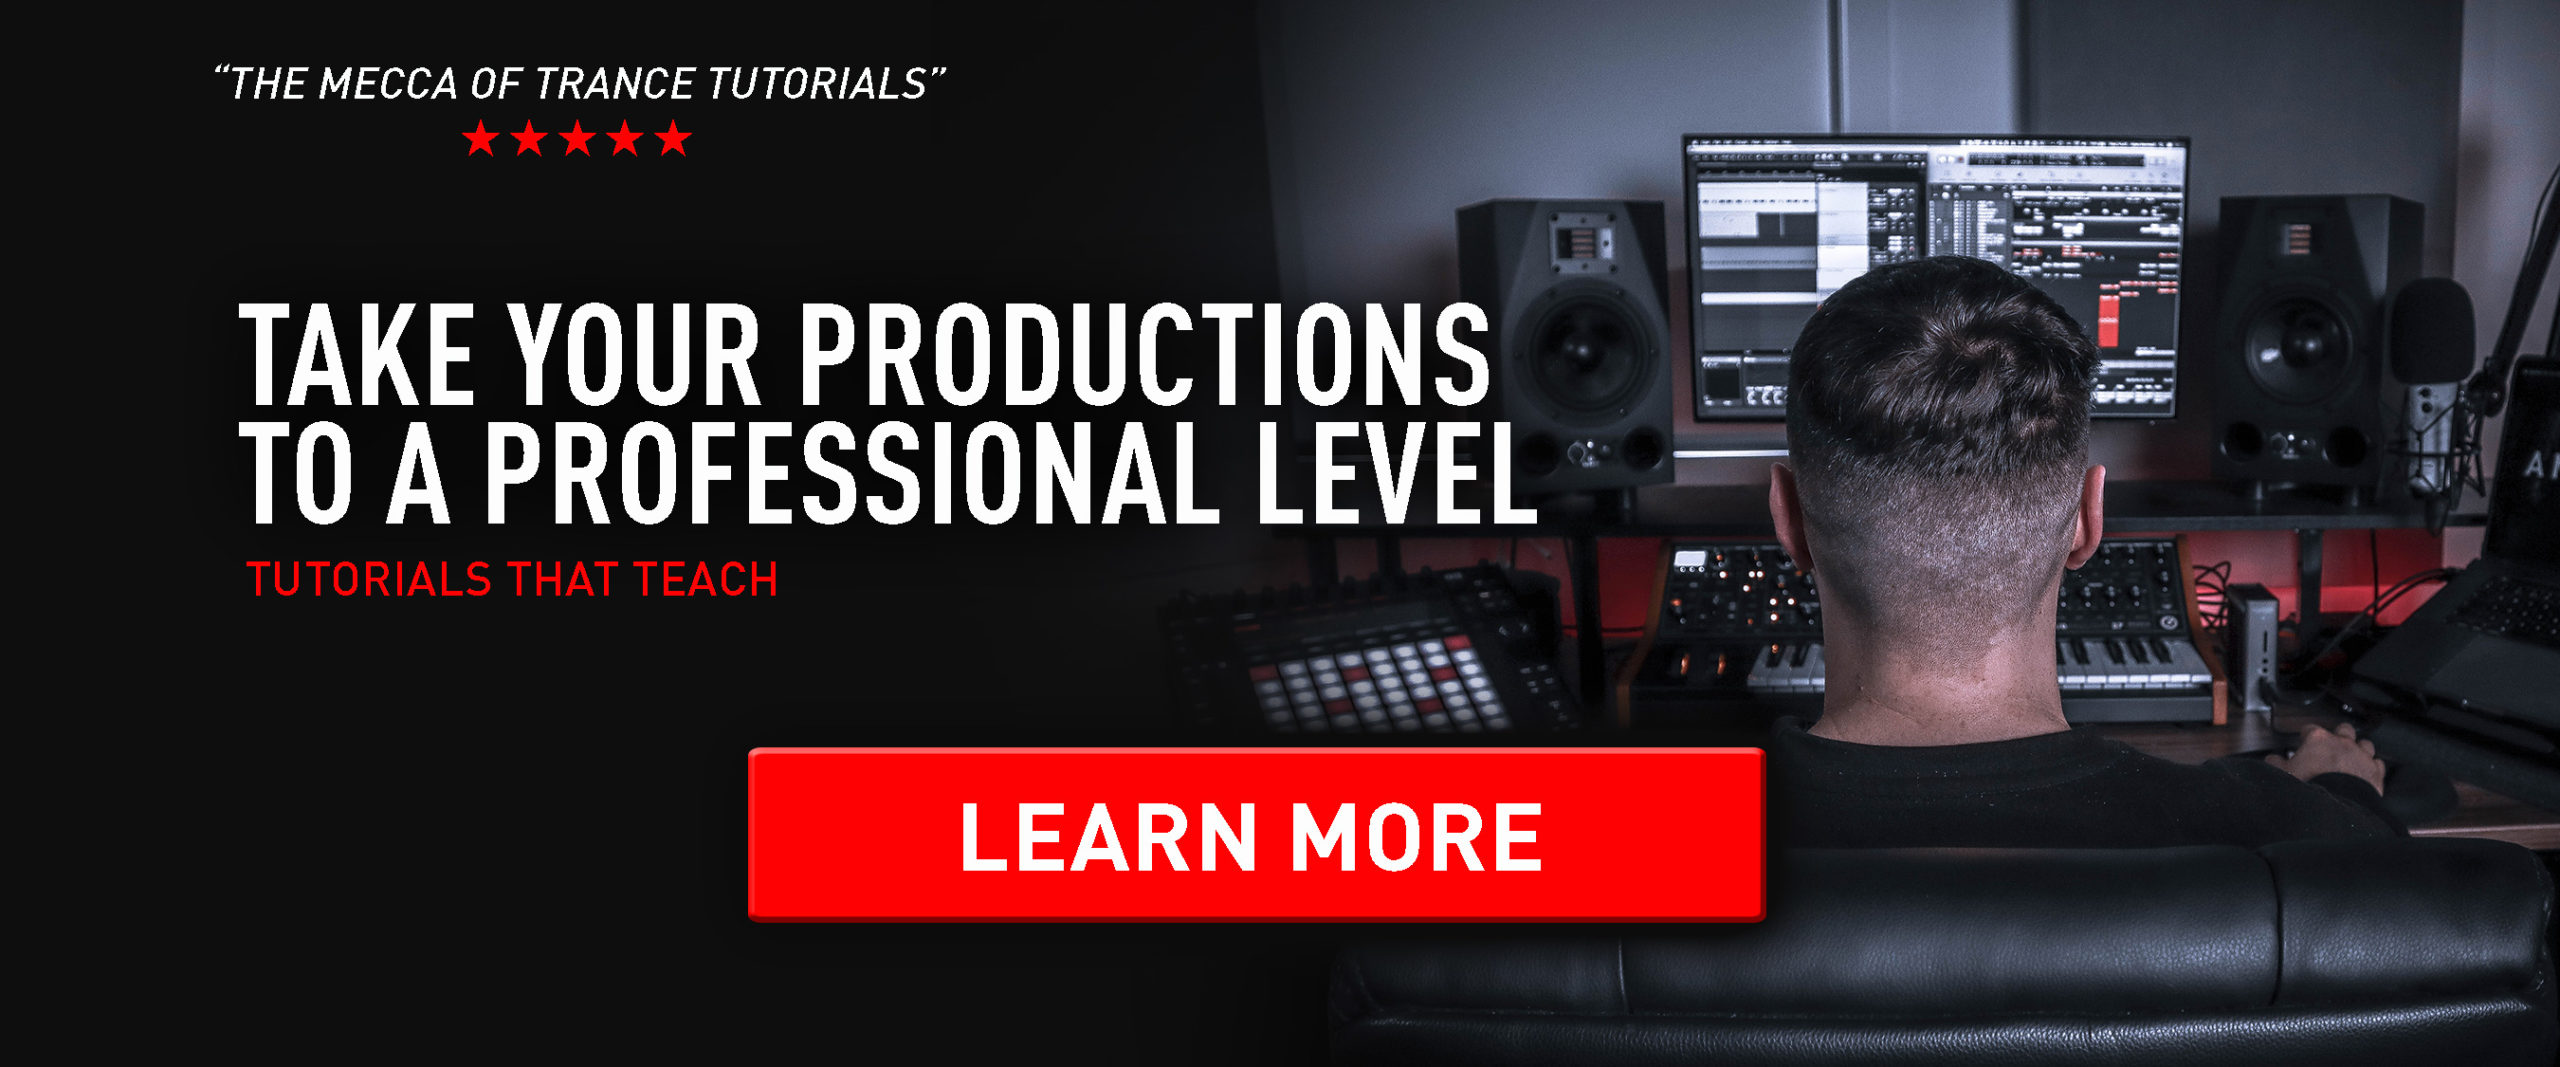 Trance tutorials